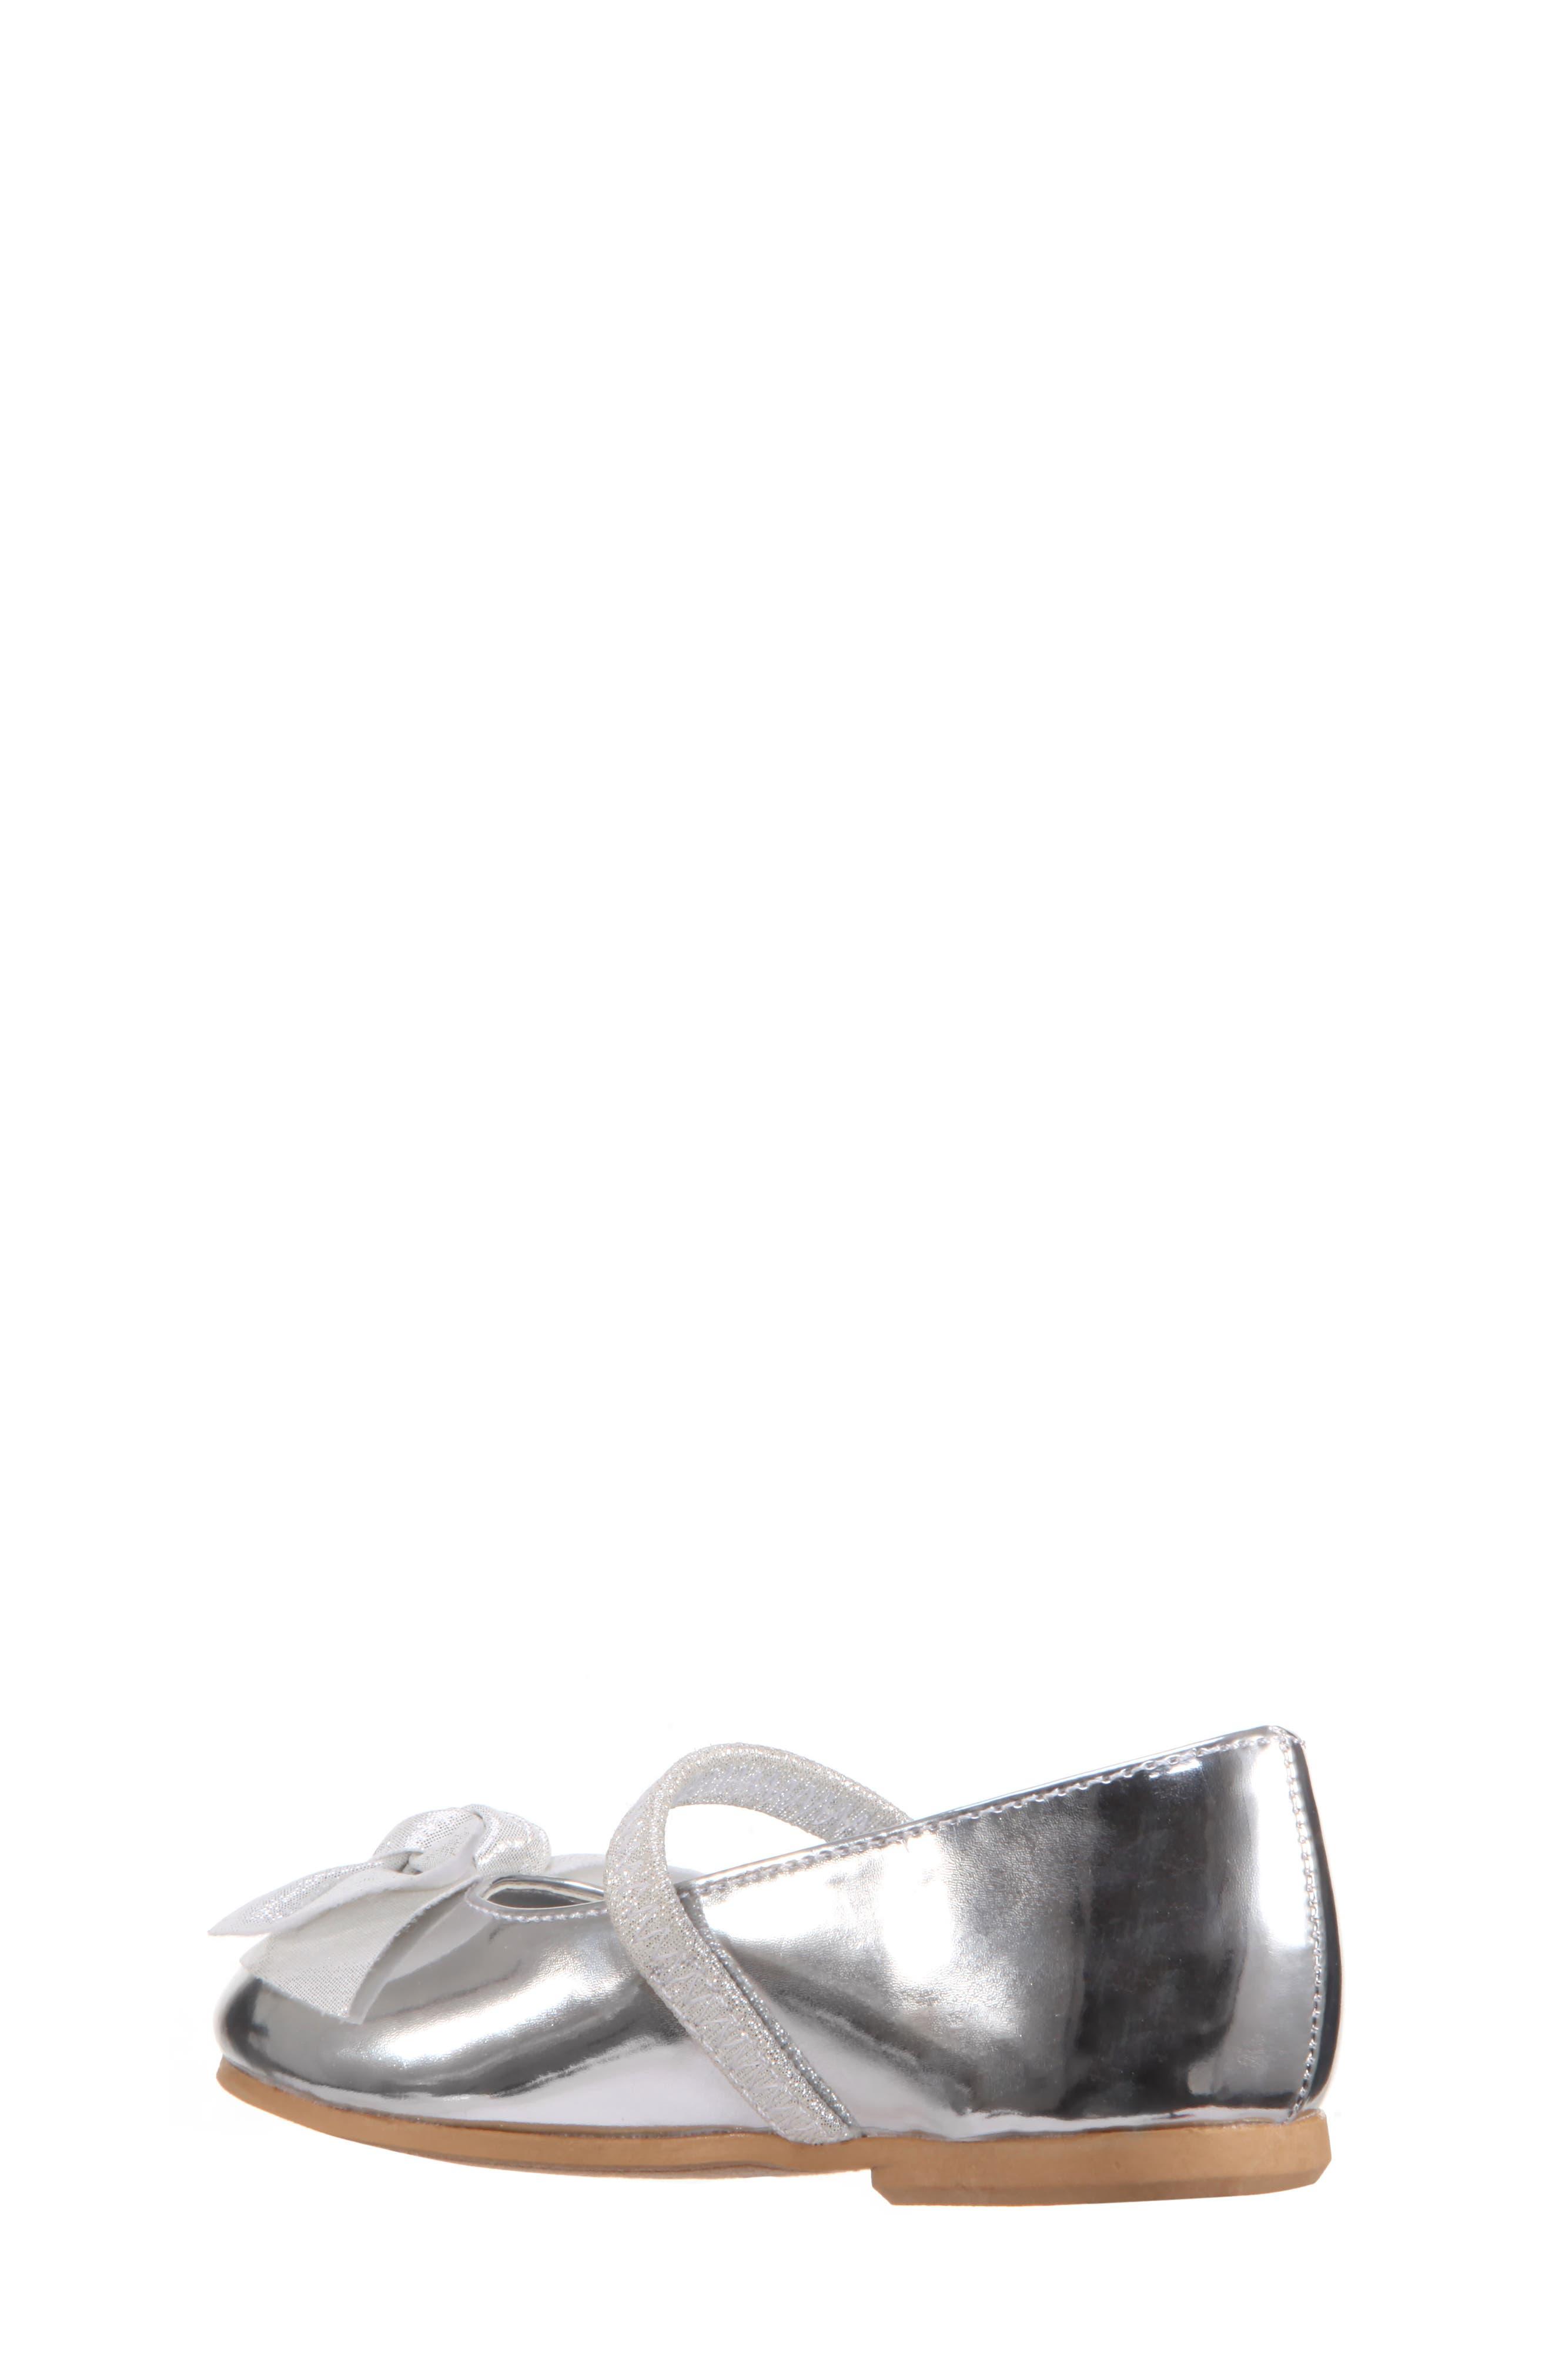 Kaytelyn-T Glitter Bow Ballet Flat,                             Alternate thumbnail 8, color,